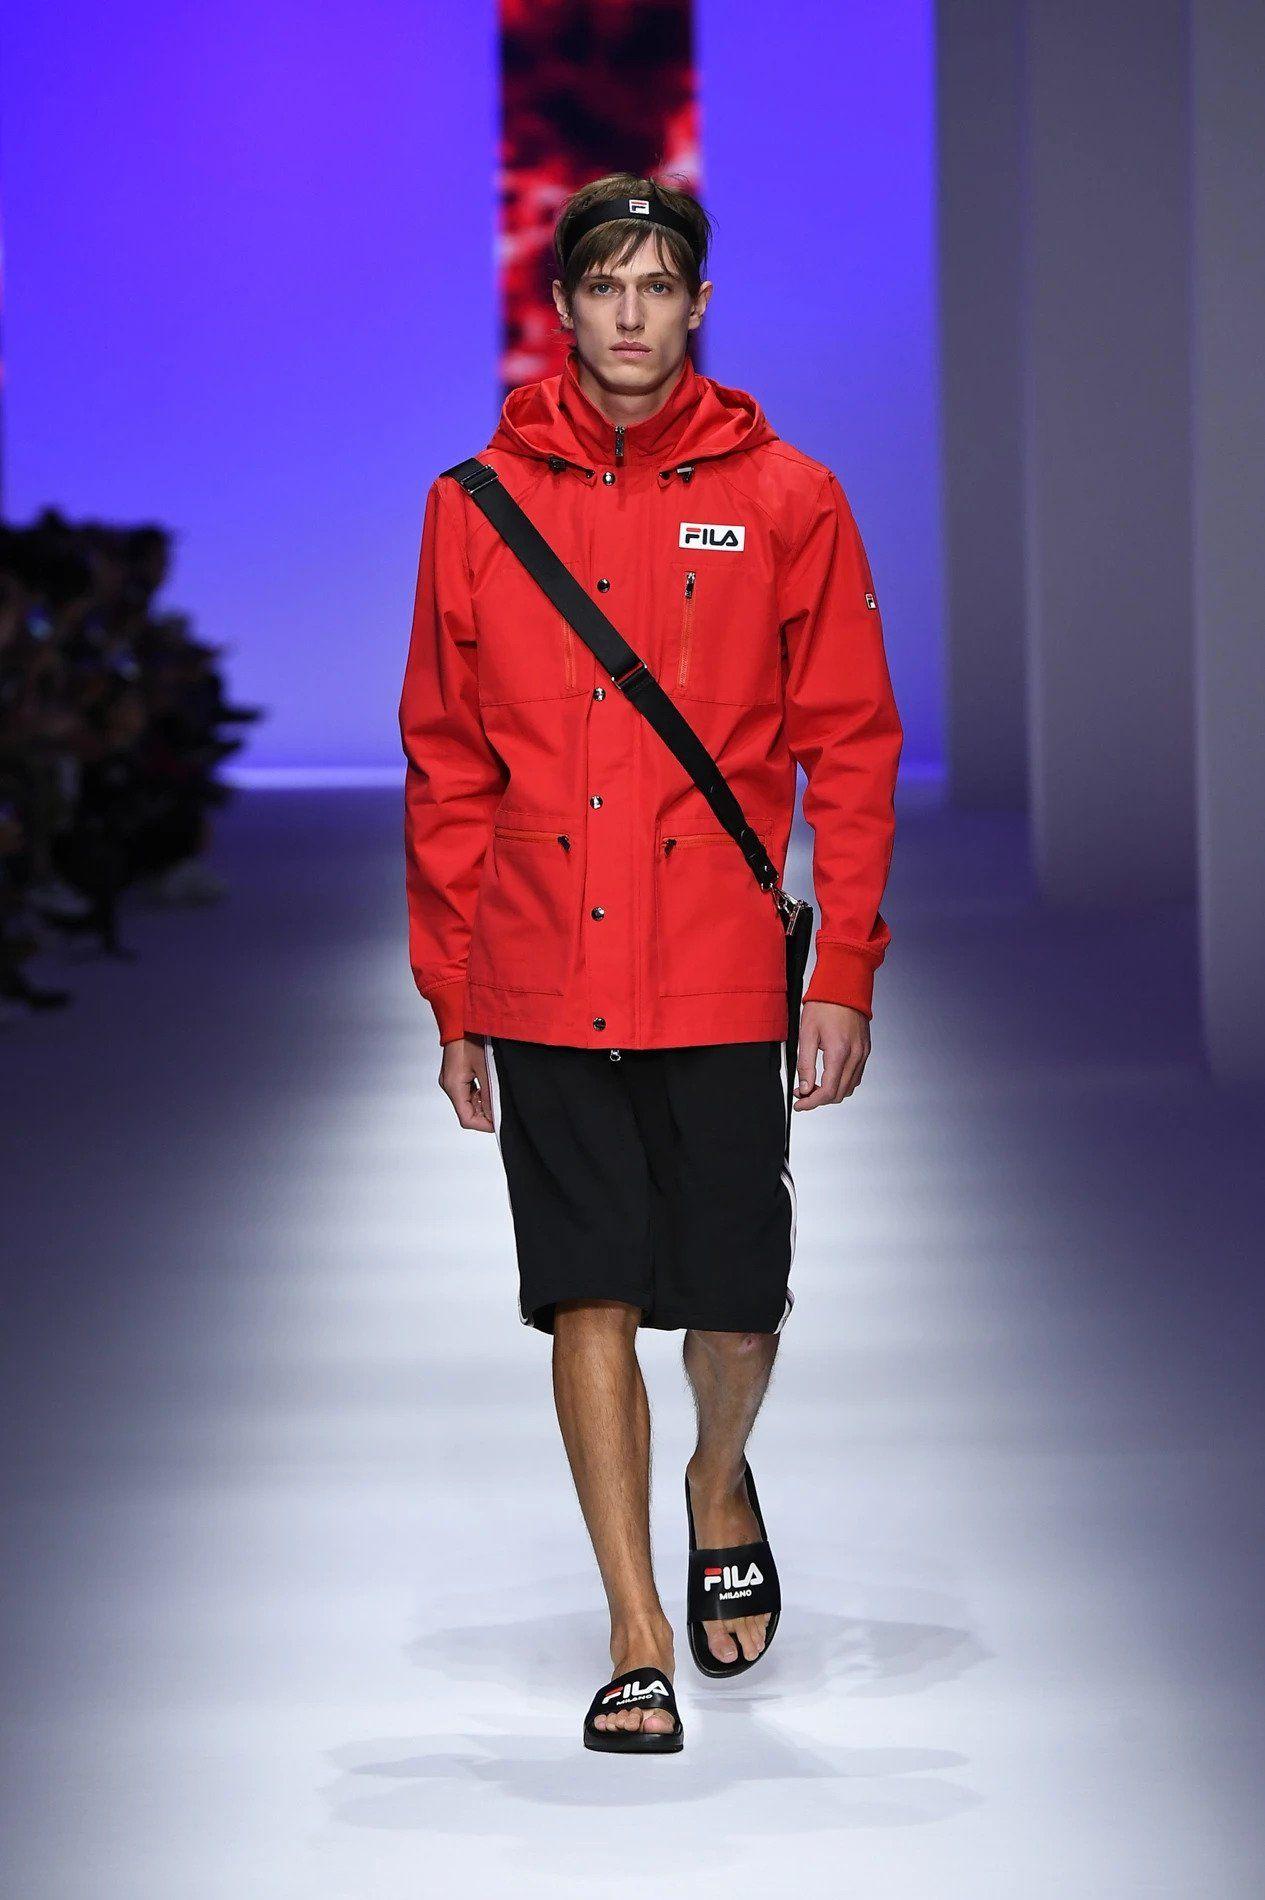 7343df0ba74 Fila ... #Milan #MFW #fashionweek #fashion #SS19 #RTW #Fila | Yes ...